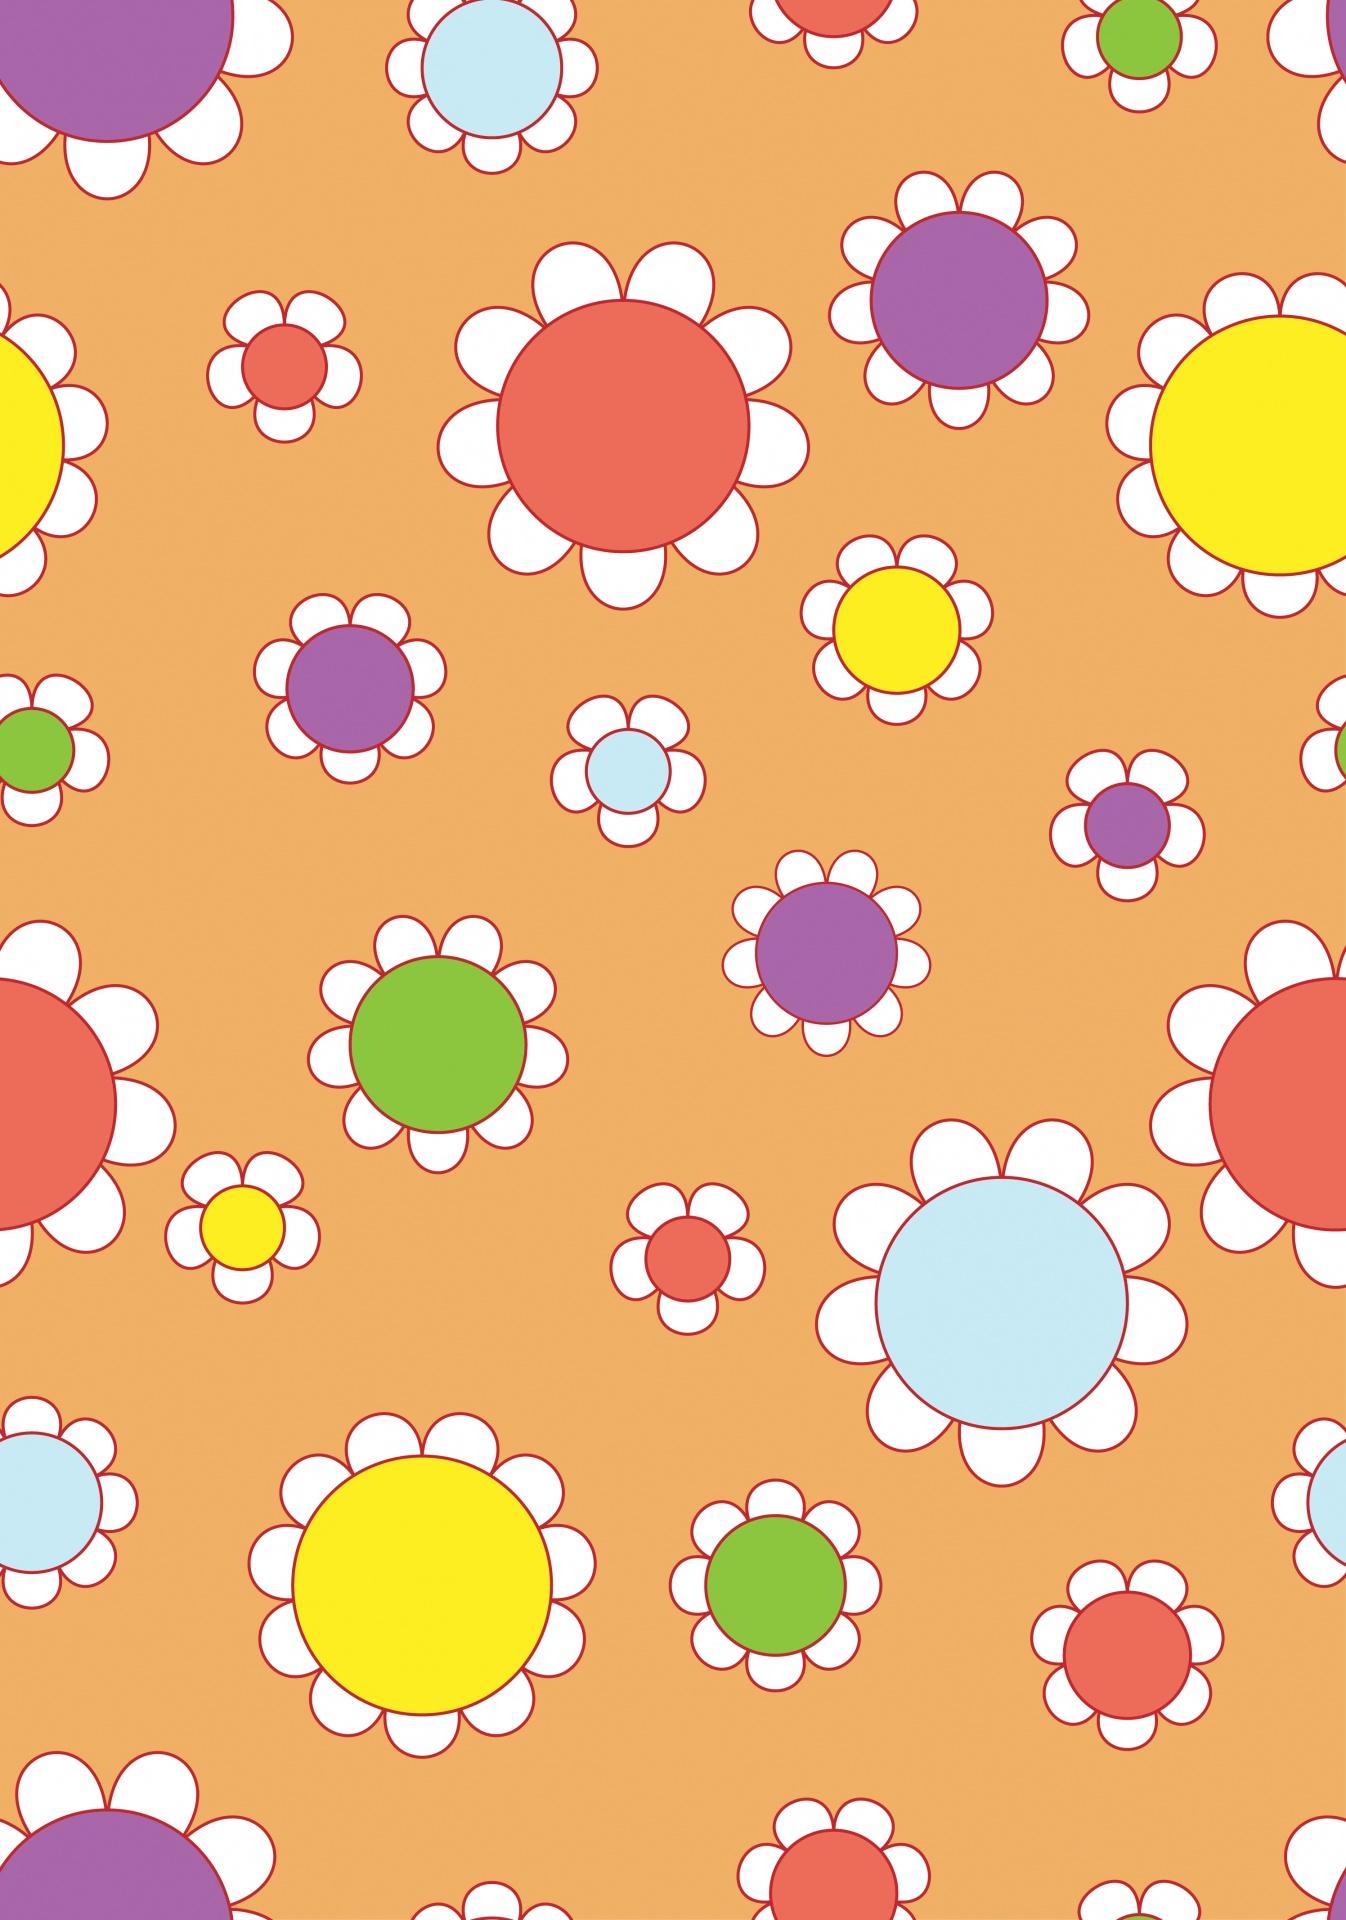 Retro Floral Flowers Flower Wallpaper Free Image From Needpix Com